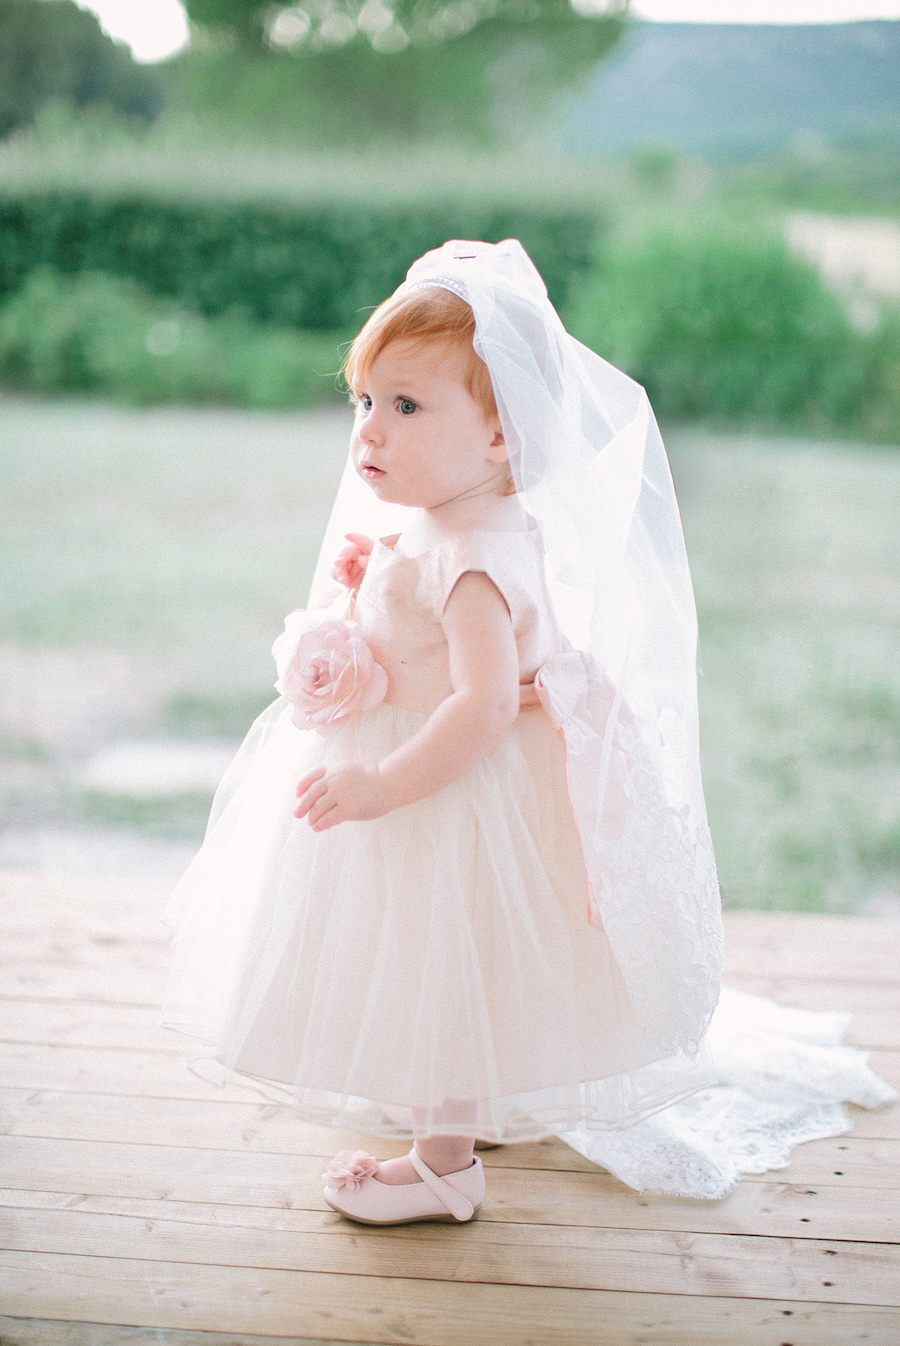 saya-photography-jewish-wedding-provence-rustic-lourmarin-le-galinier-54.jpg